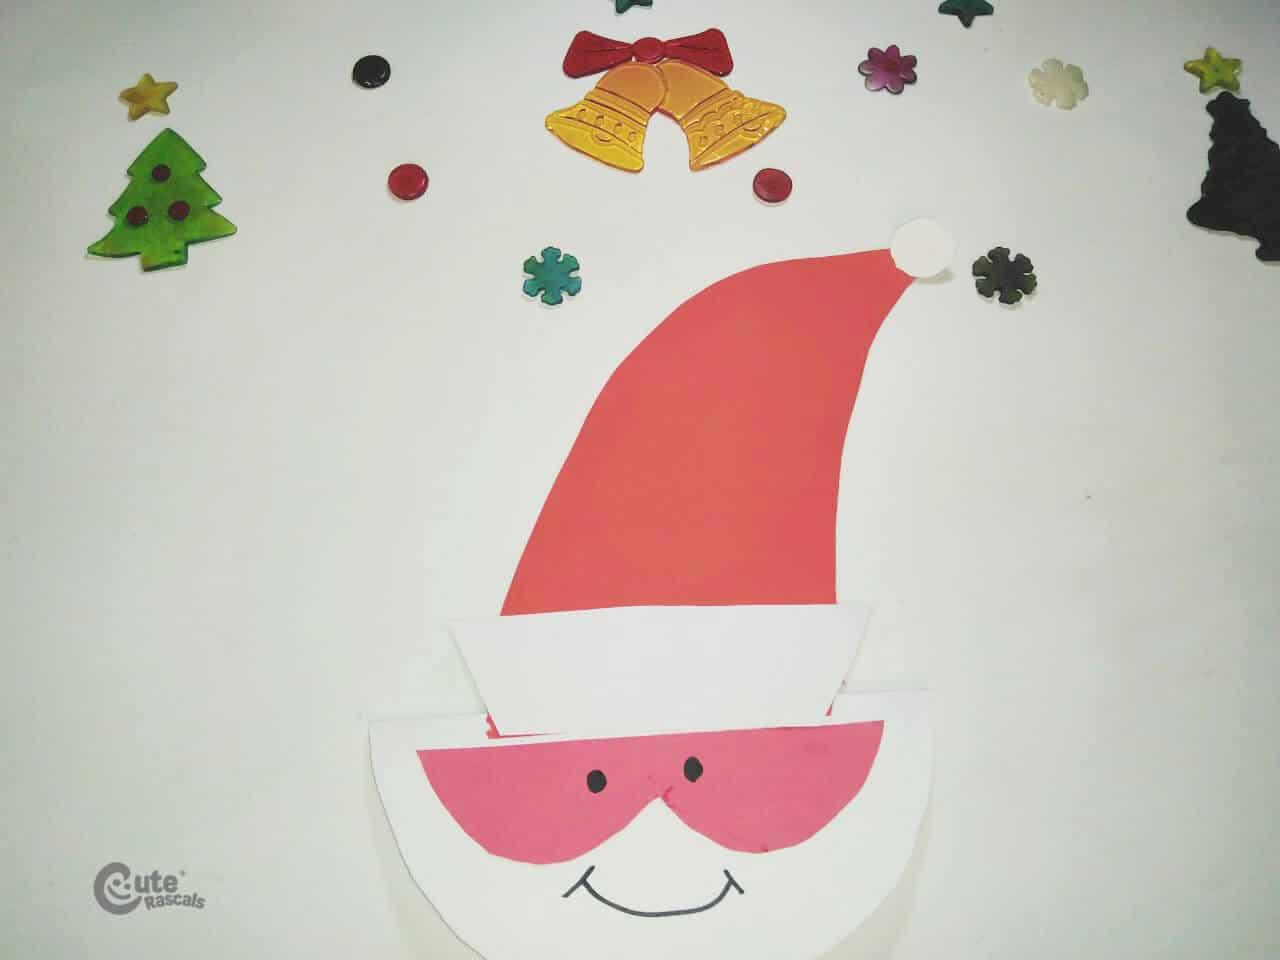 Santa Claus handcraft